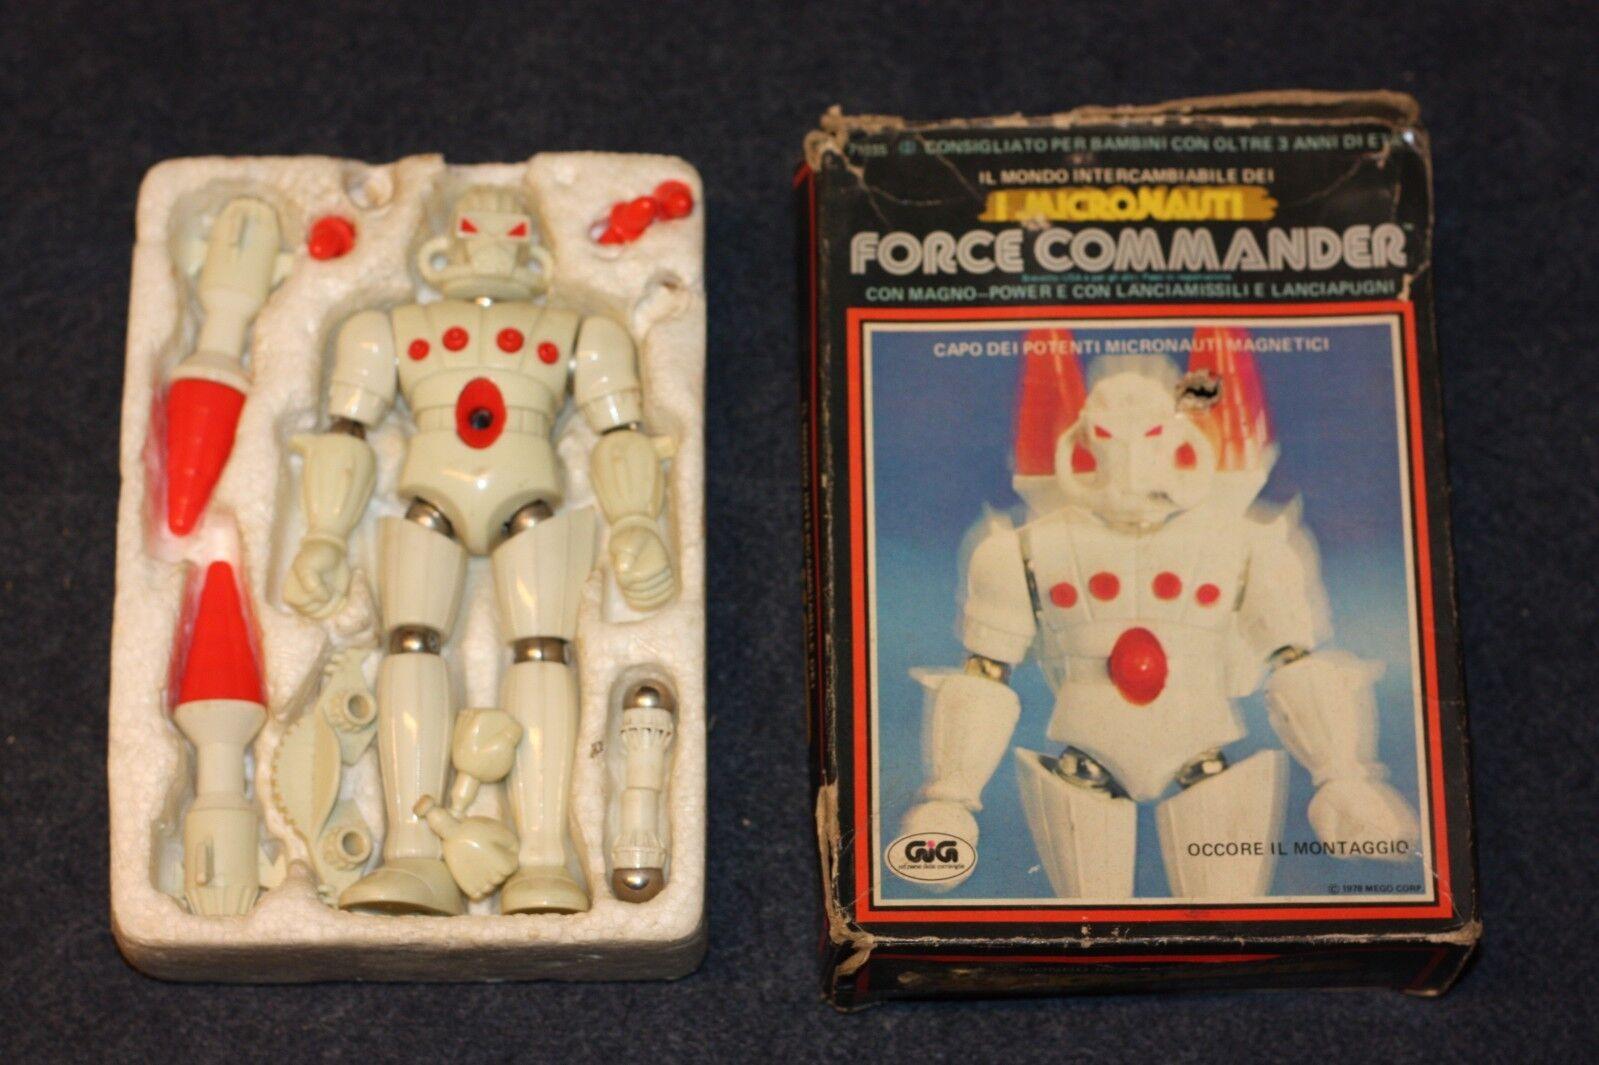 MICRONAUTI MICRONAUTS  ROBOT FORCE COMMANDER - MEGO GIG - COMPLETO - FL - G9